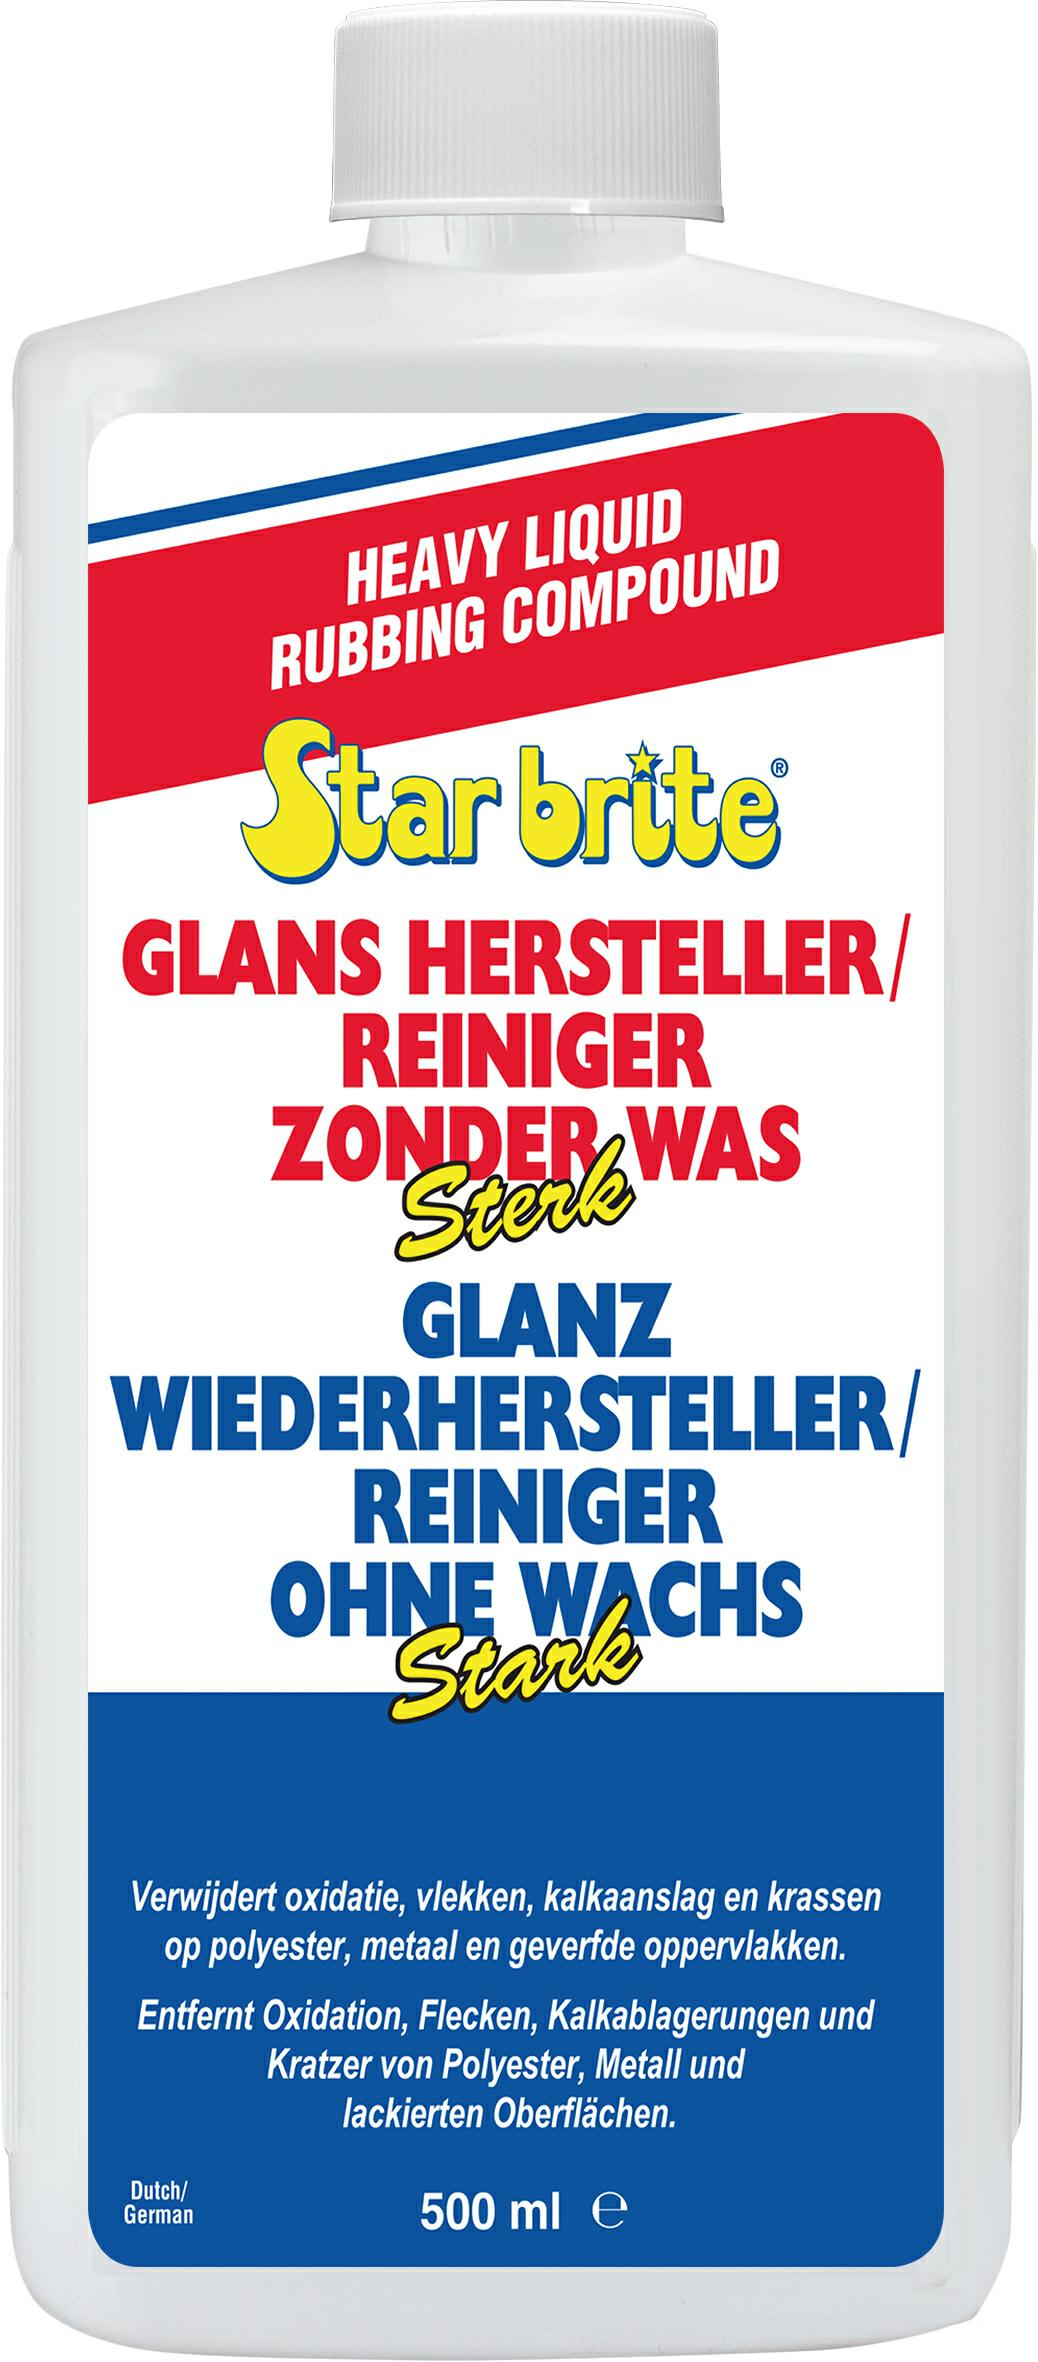 Glans Hersteller zonder Was - Sterk 500 ml